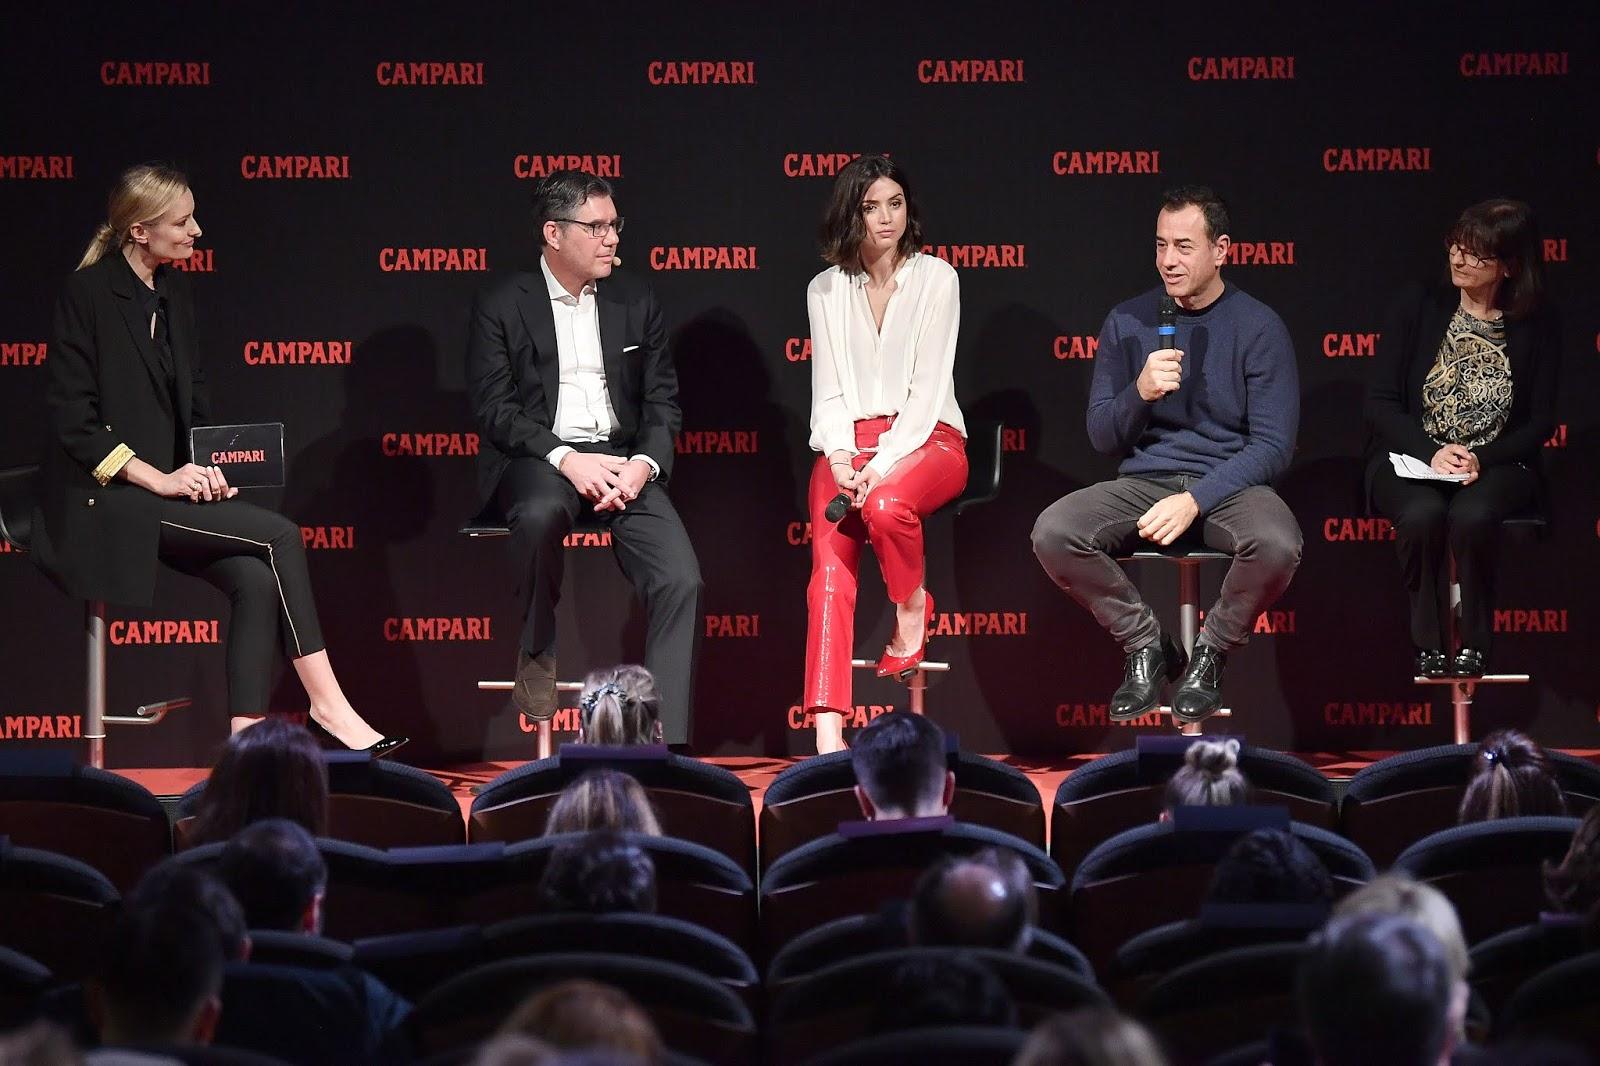 Ana de Armas - Campari Red Diaries 2019 Press Conference in Milan - 02/05/2019